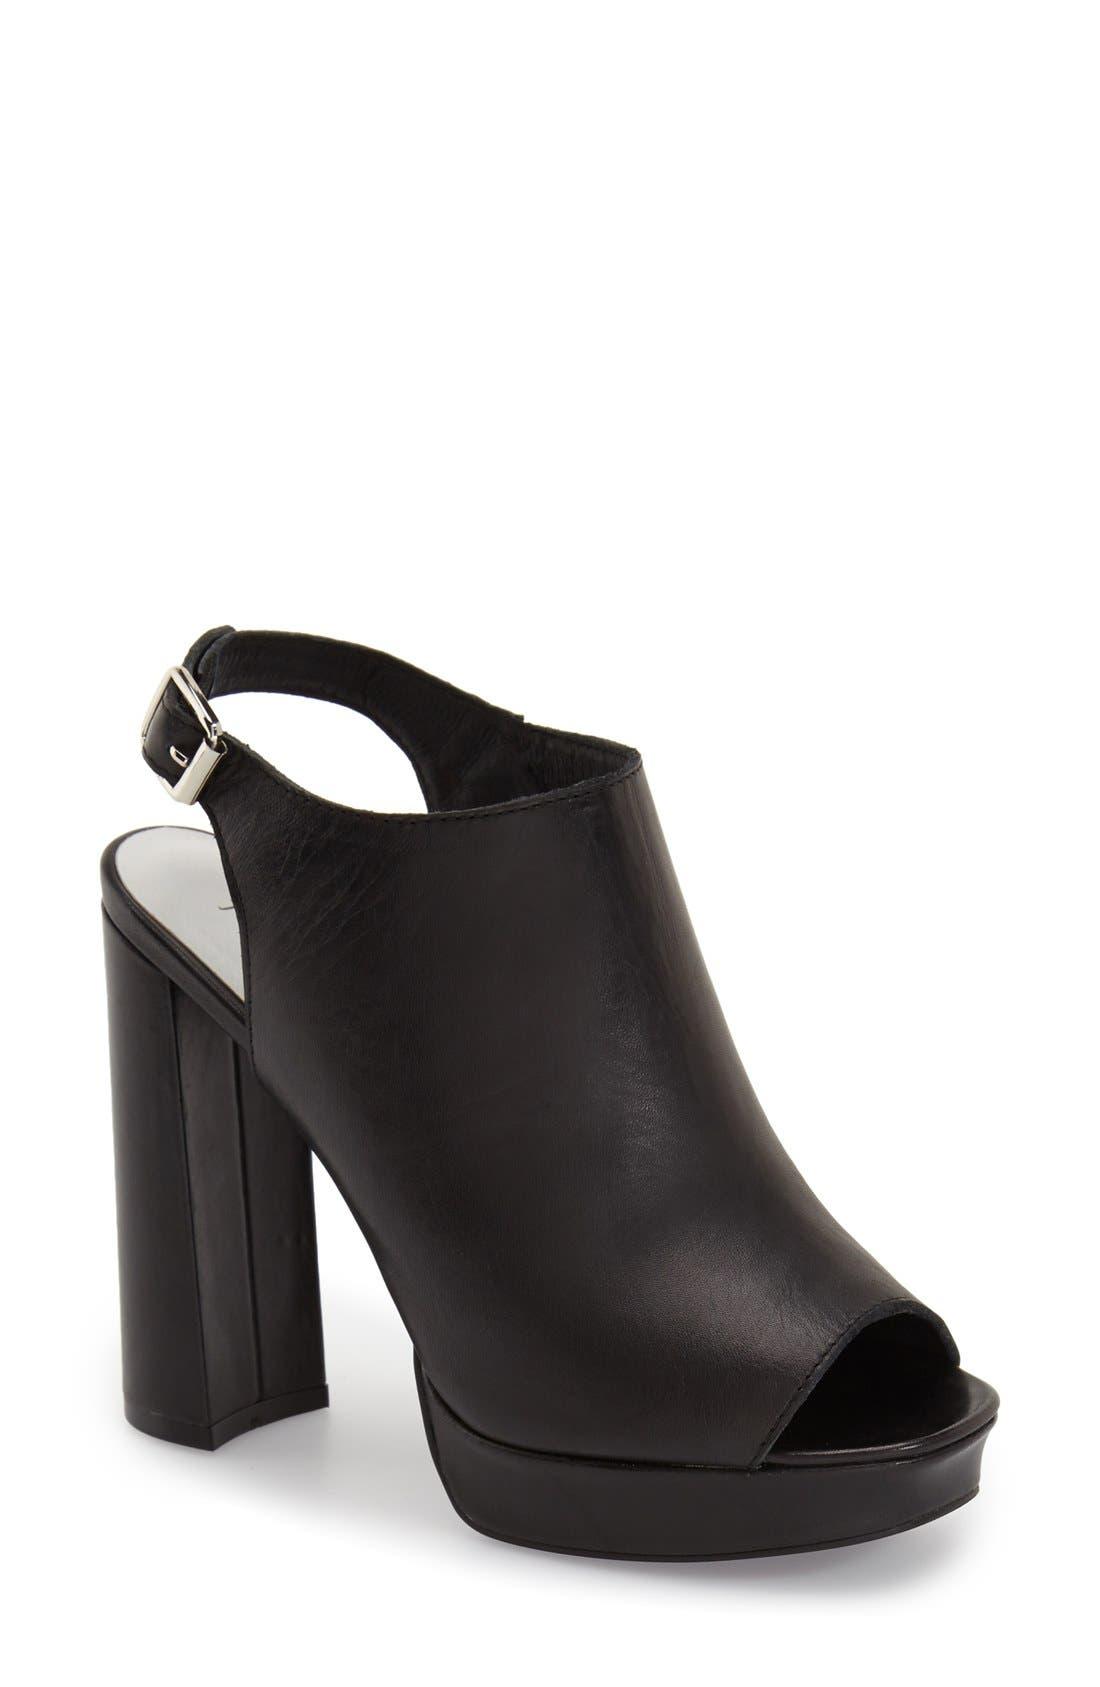 Alternate Image 1 Selected - Jeffrey Campbell 'Payola' Platform Sandal (Women)